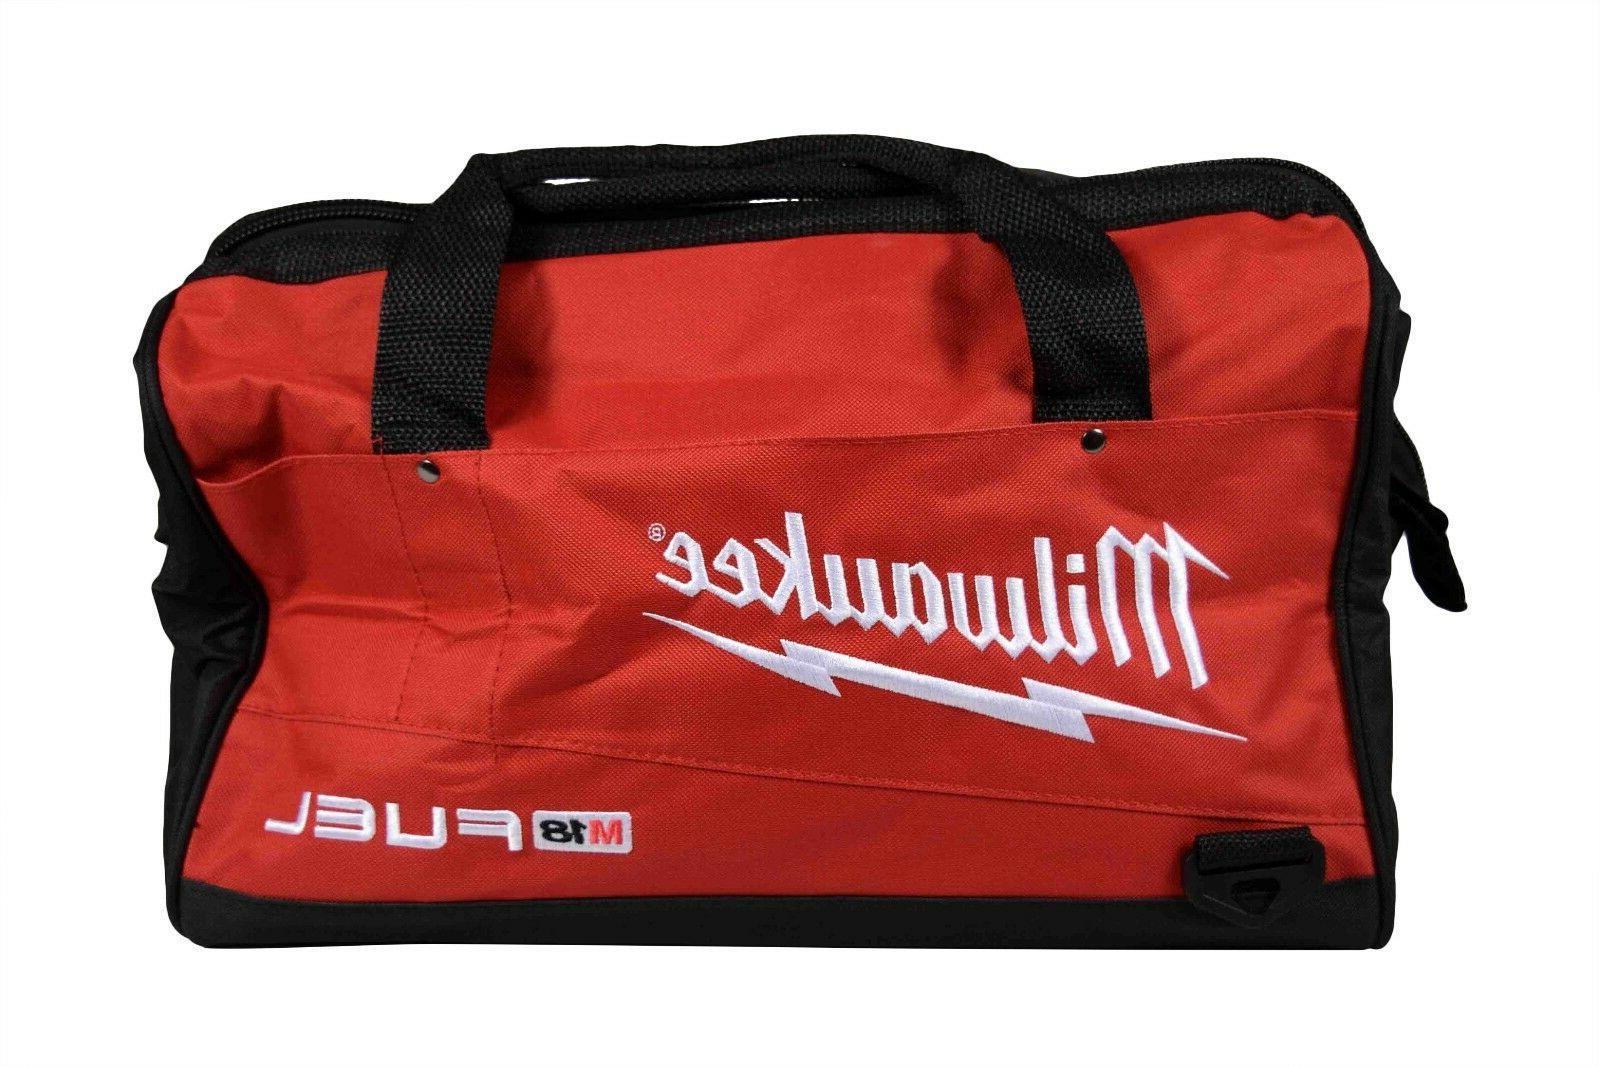 Milwaukee Heavy Duty Fuel 16 inch Tool Bag for Milwaukee Cor